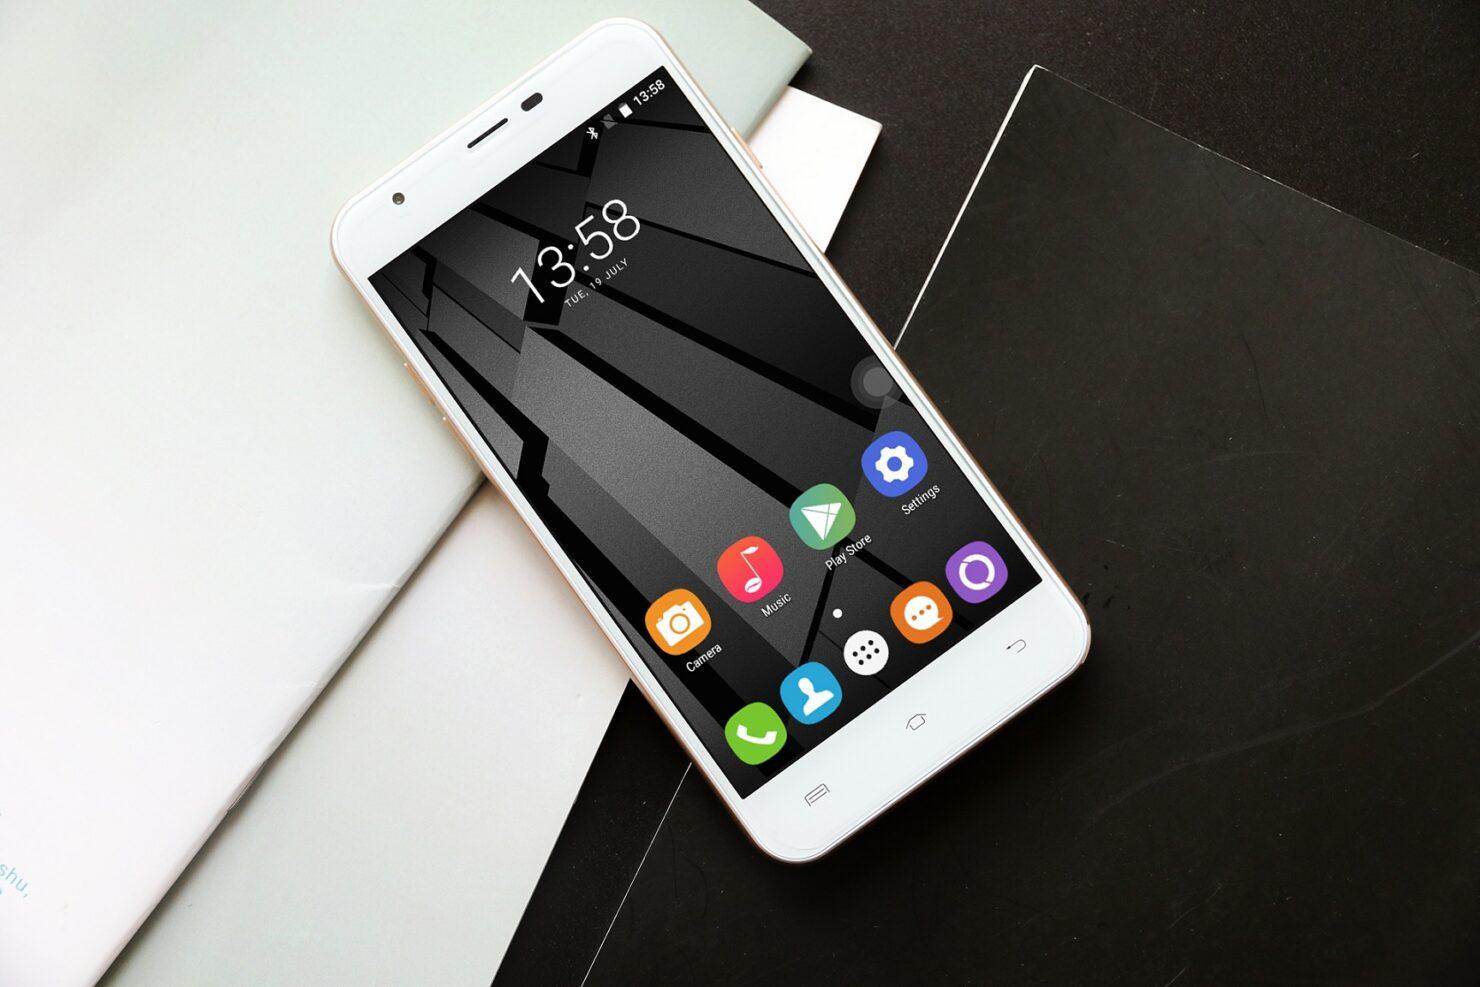 OUKITEL U7 Plus officially announced